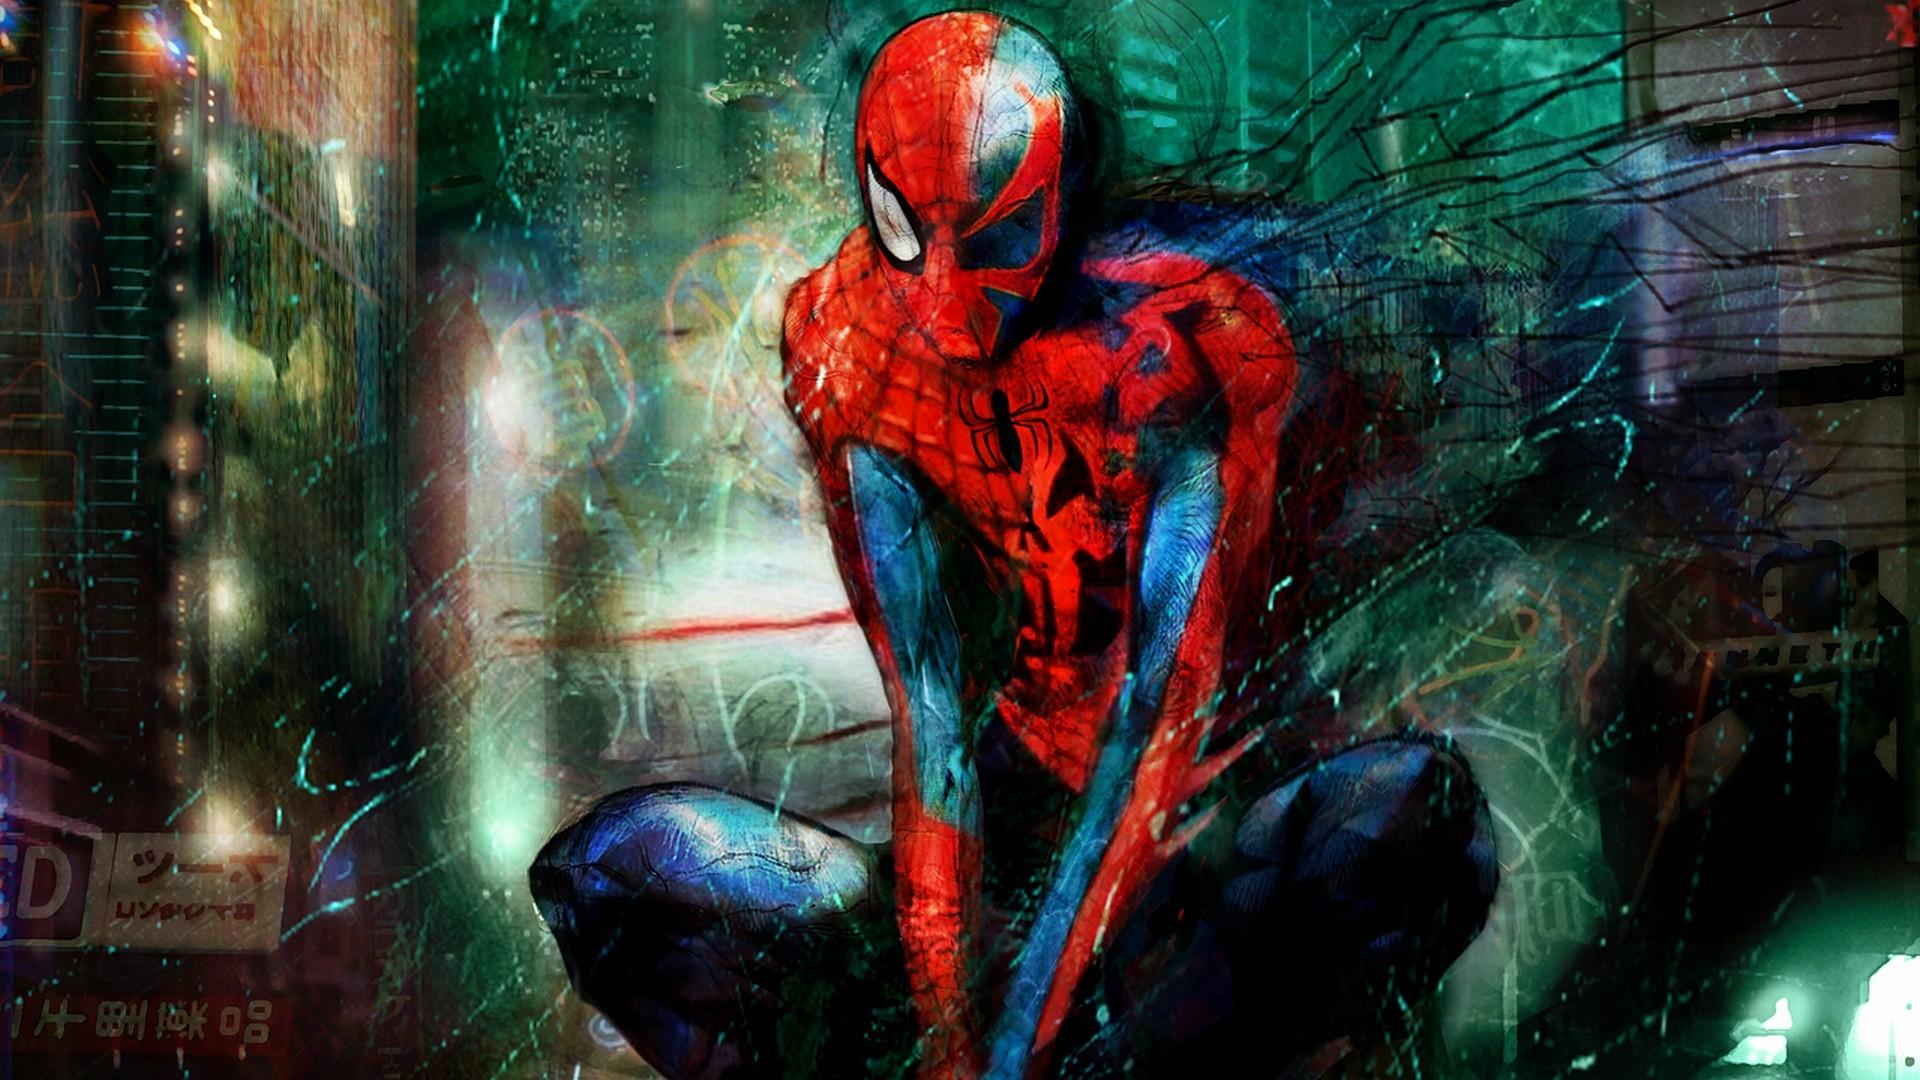 1920x1438 The Amazing SpiderMan HD desktop wallpaper : Widescreen : High 1920×1438 The Amazing Spider